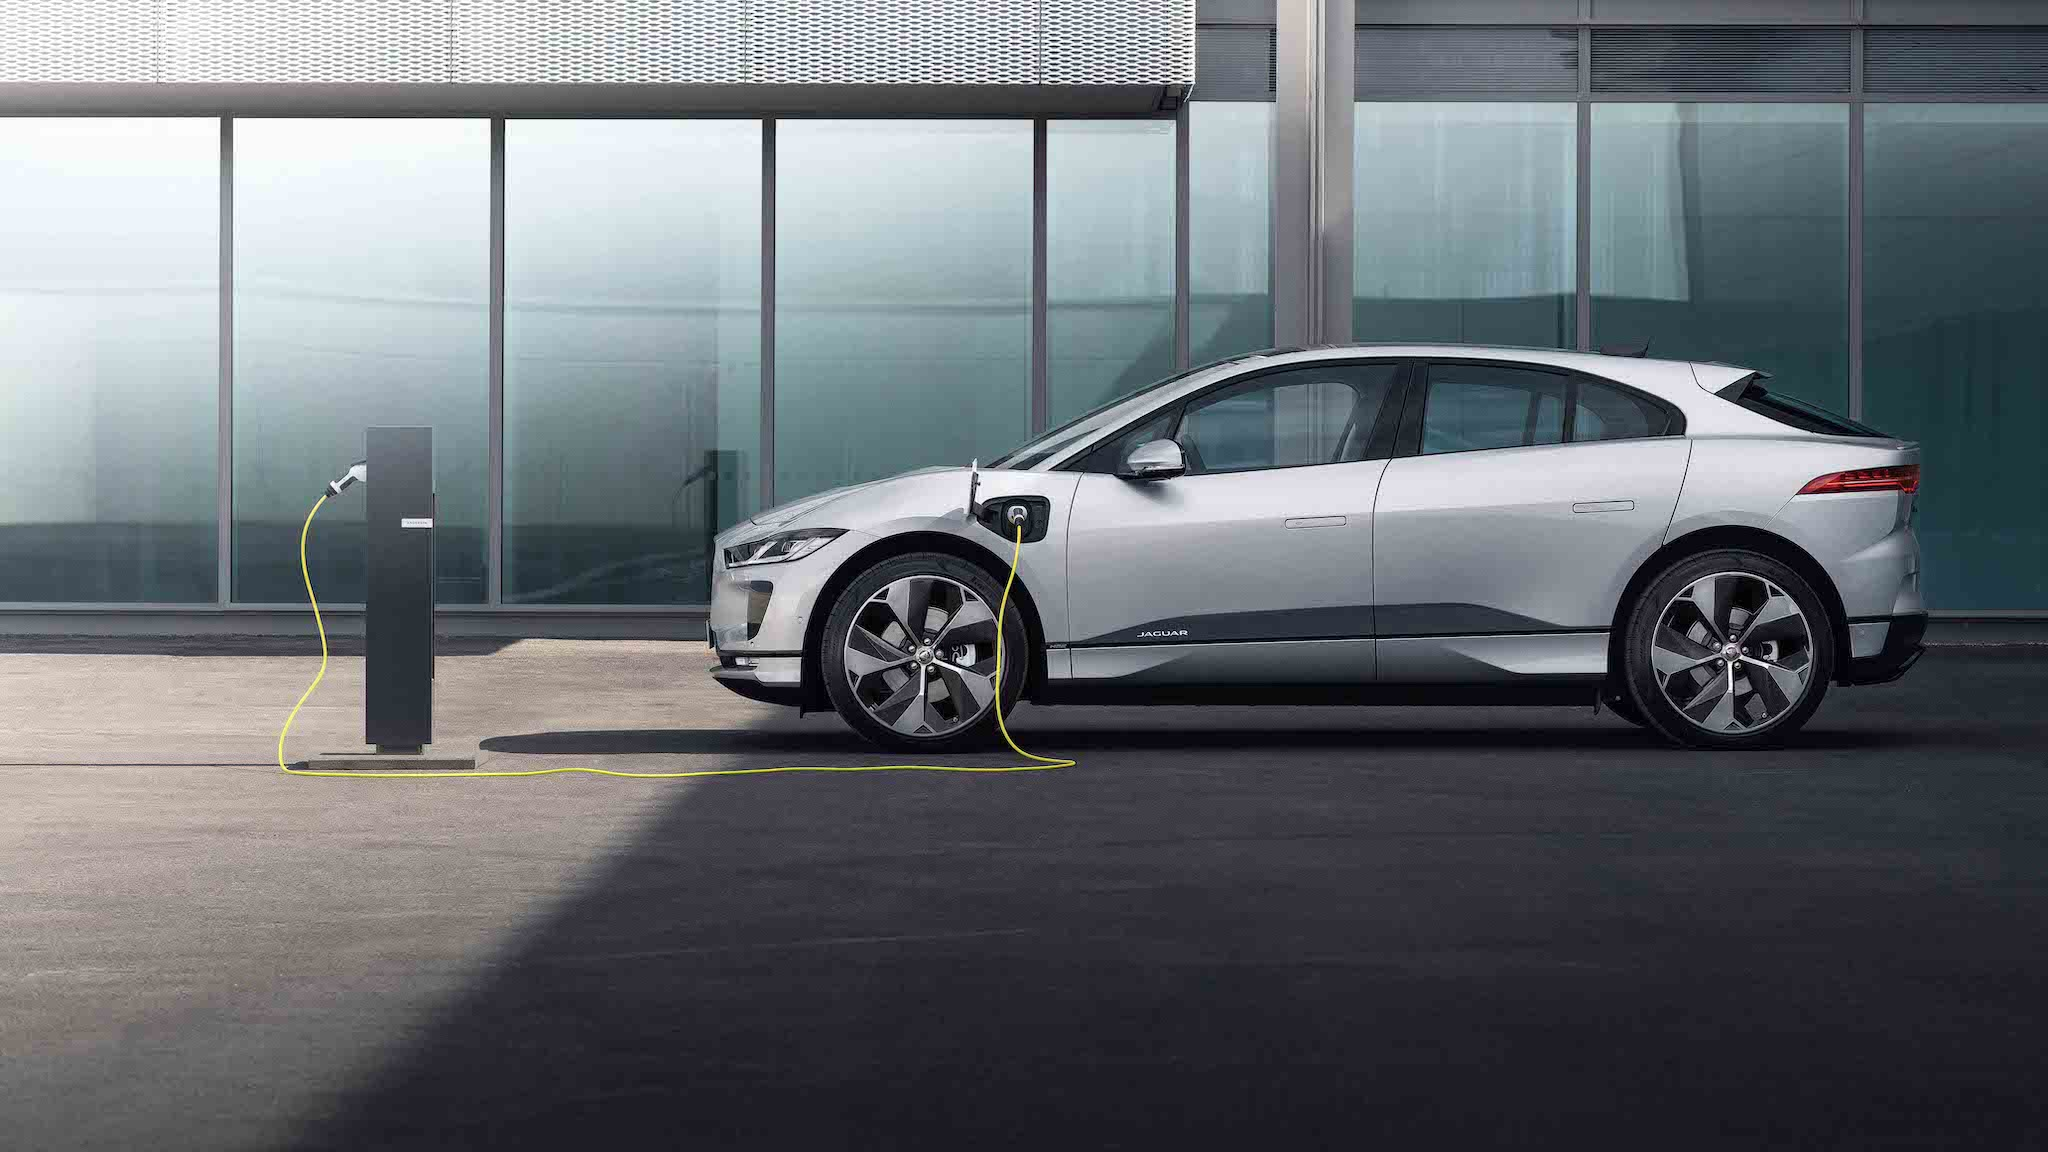 促進電動車發展,Jaguar Land Rover 成為 World EV Day 創始夥伴